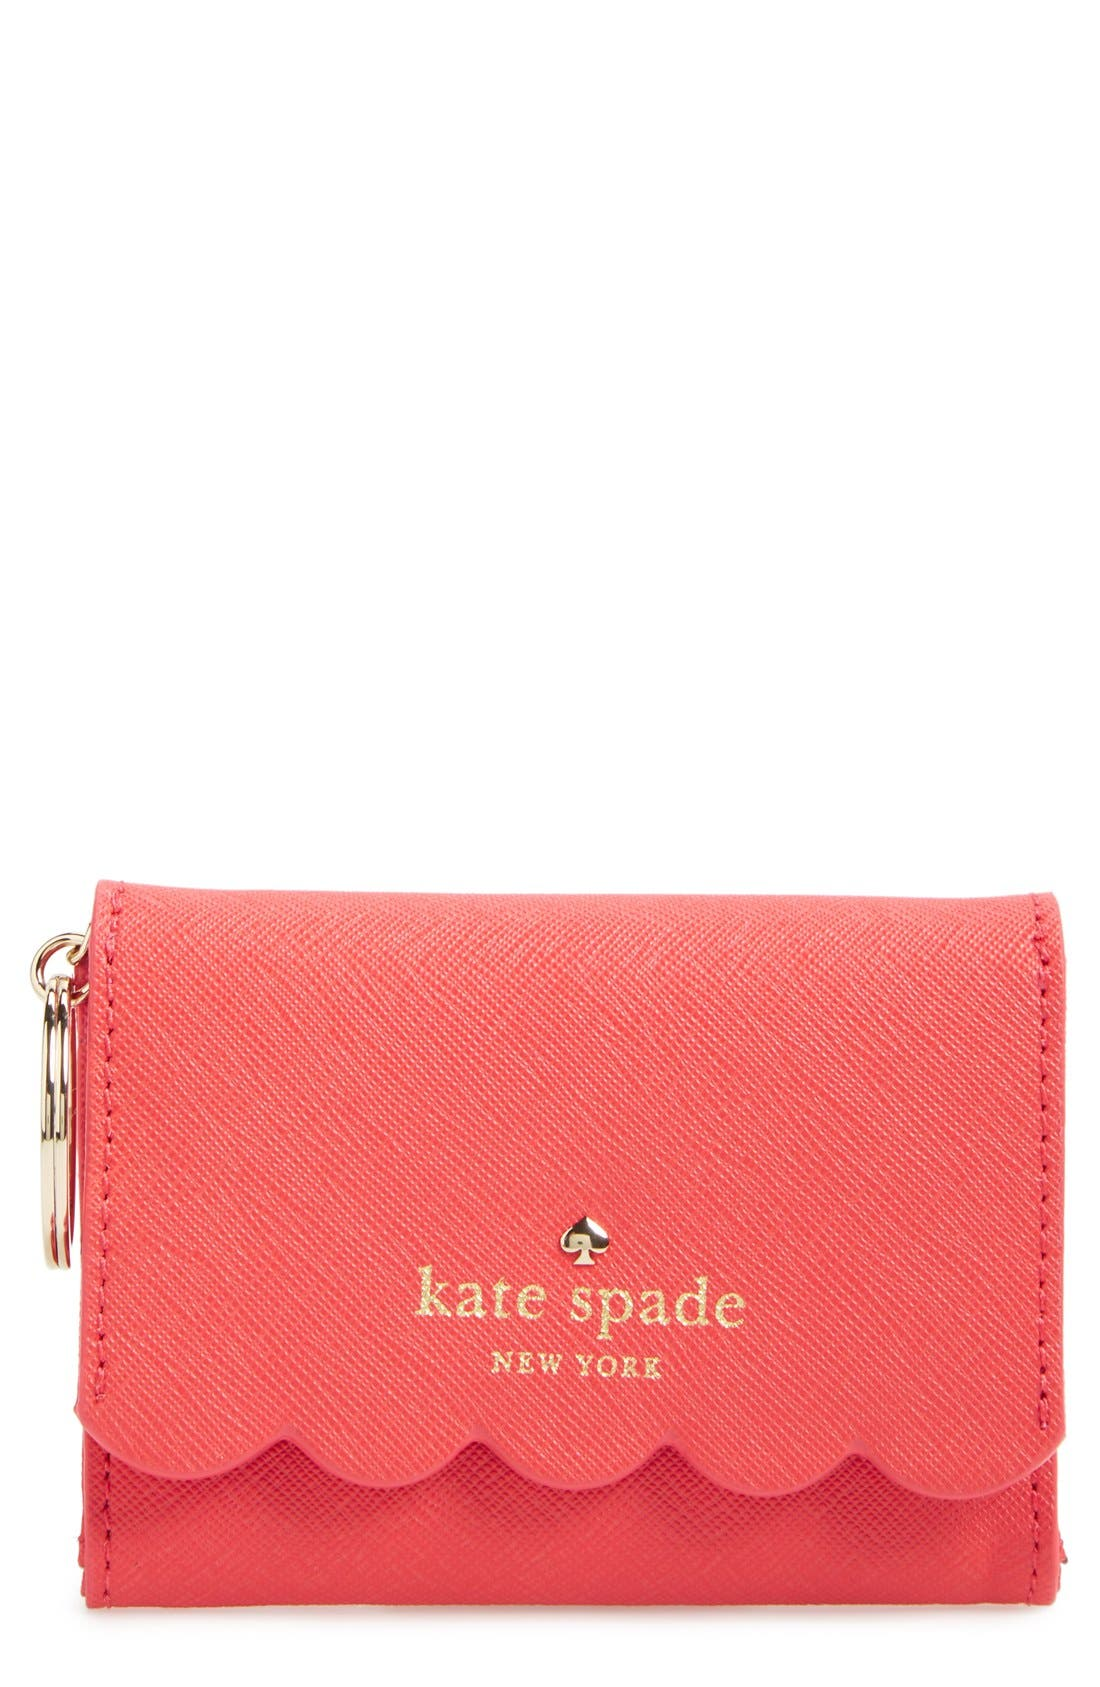 'lily avenue - darla' leather wallet,                         Main,                         color, Geranium/ Bright Geranium